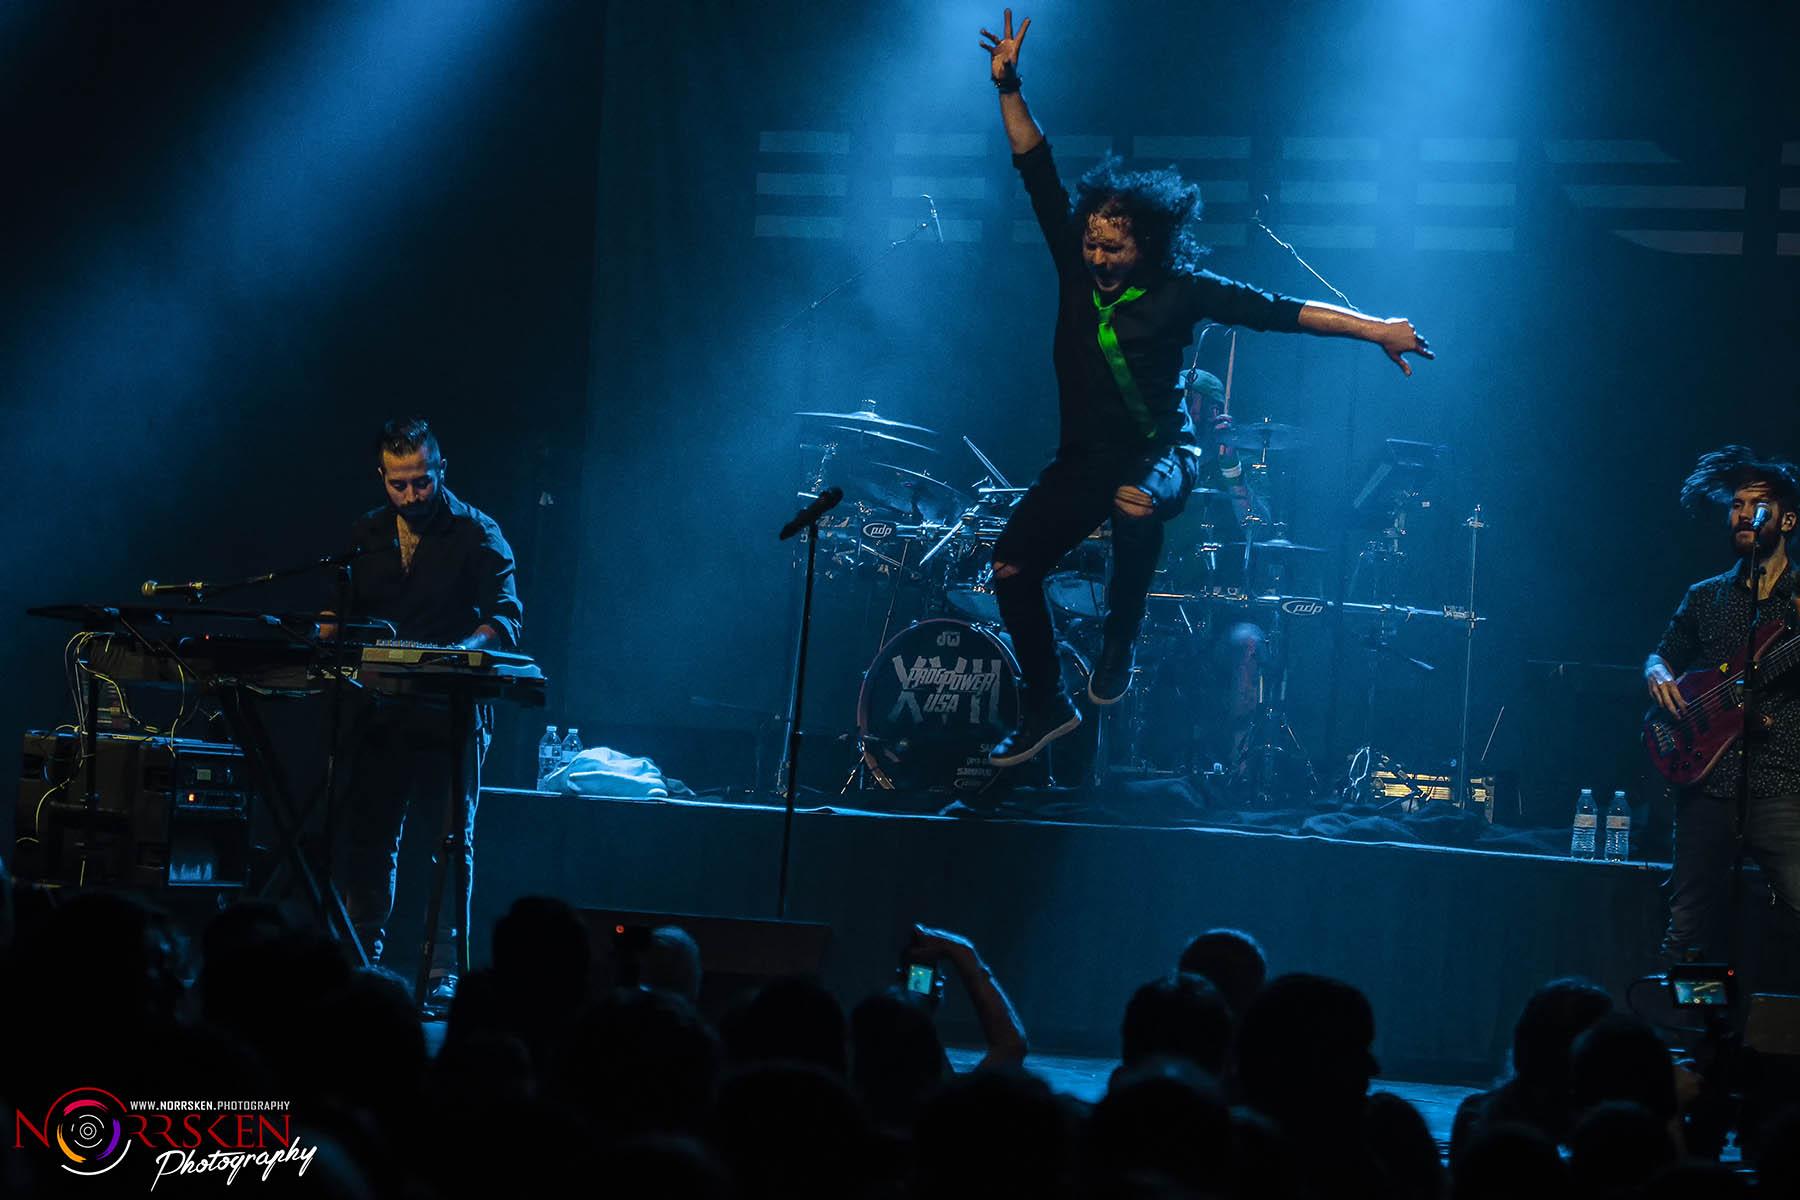 Concert Review: Haken at ProgPower USA VXII, 9-10-16